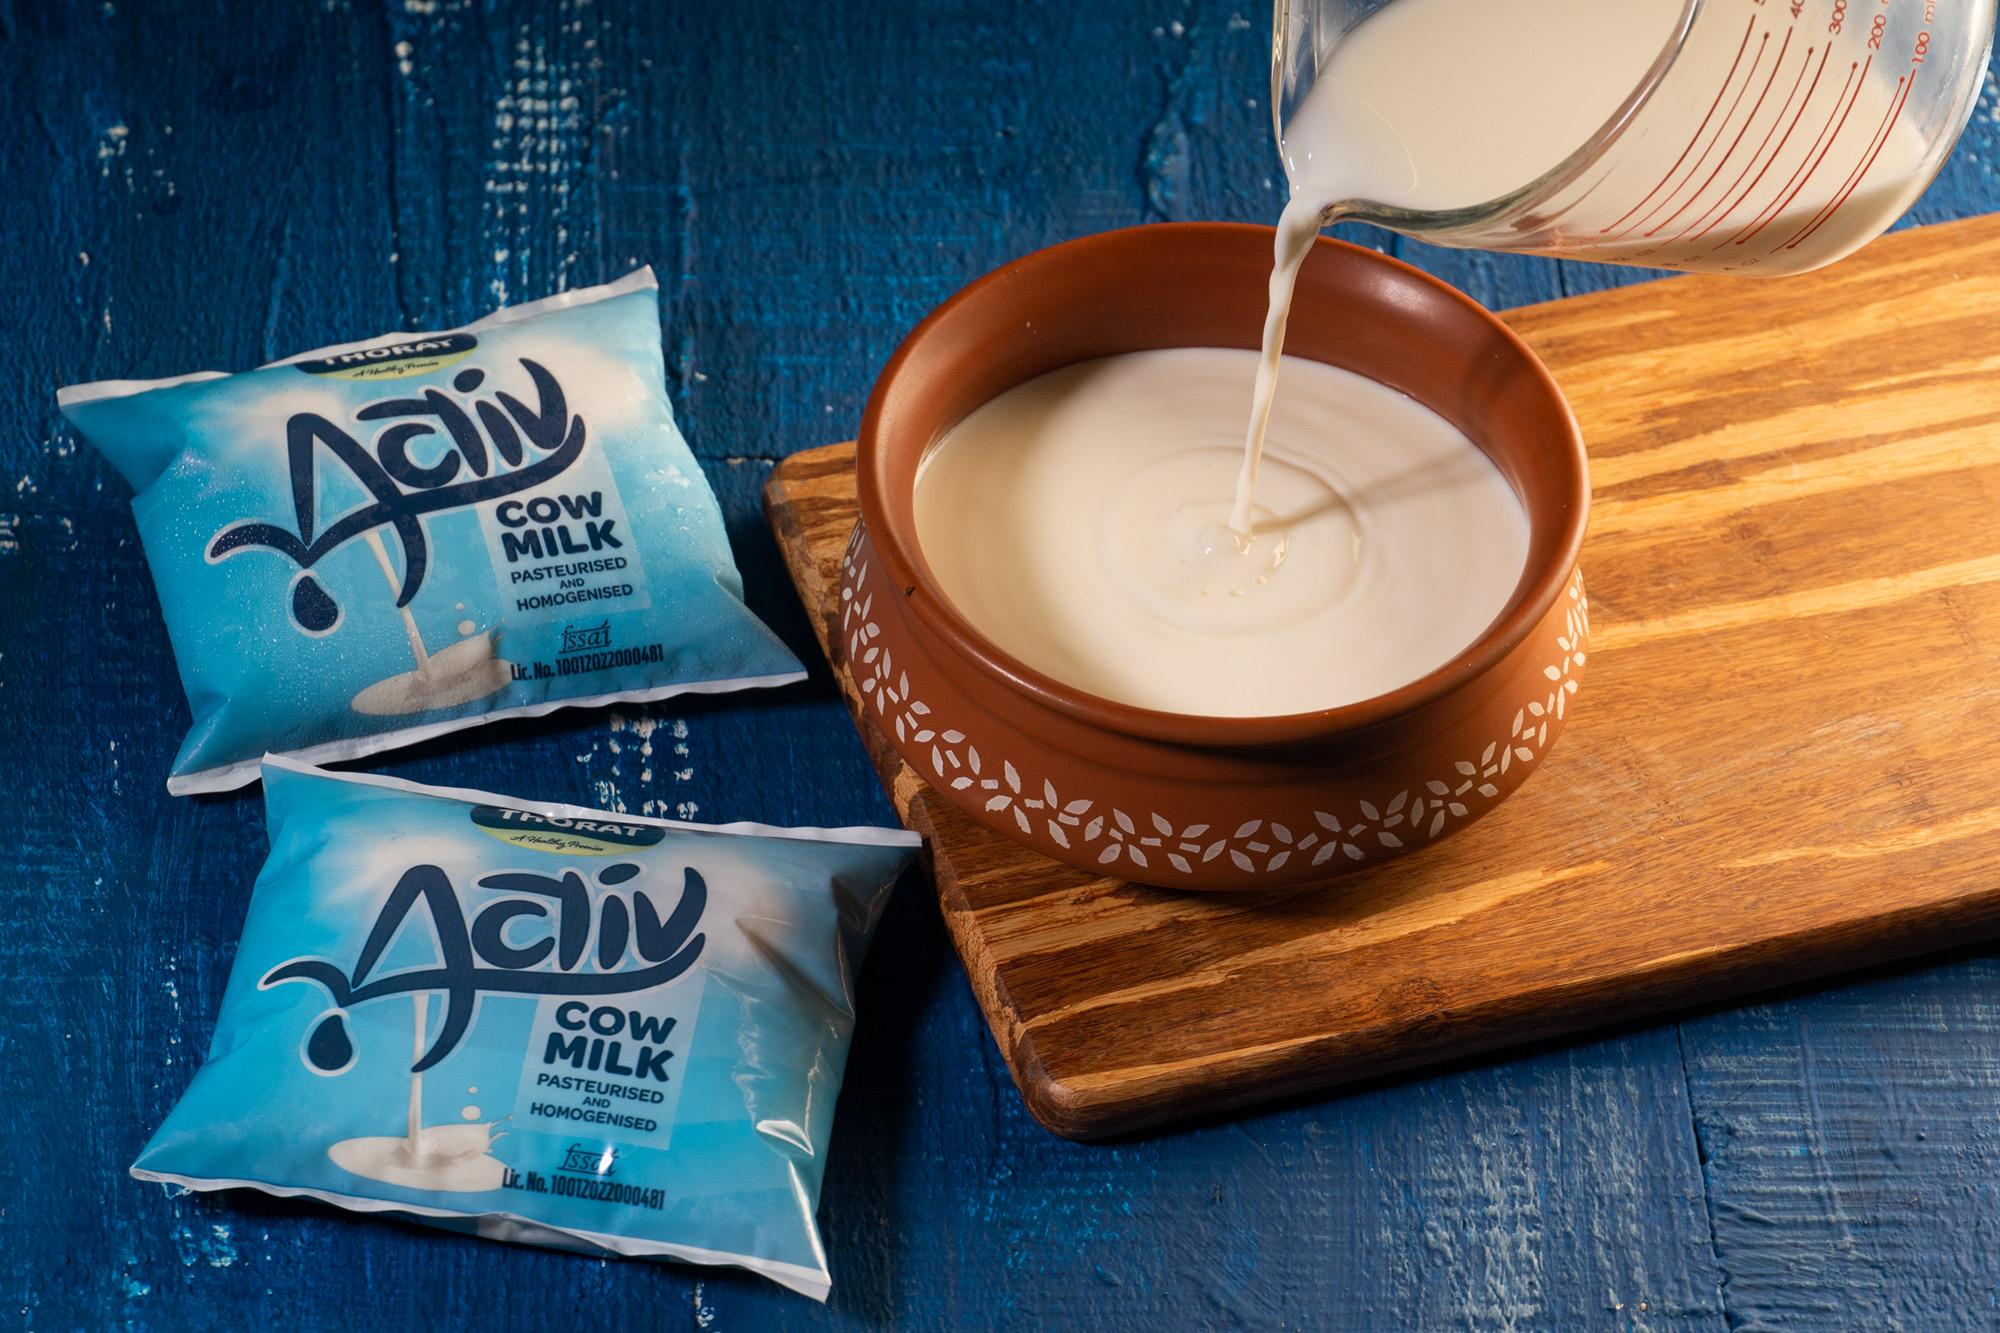 Pour warm milk in the pot